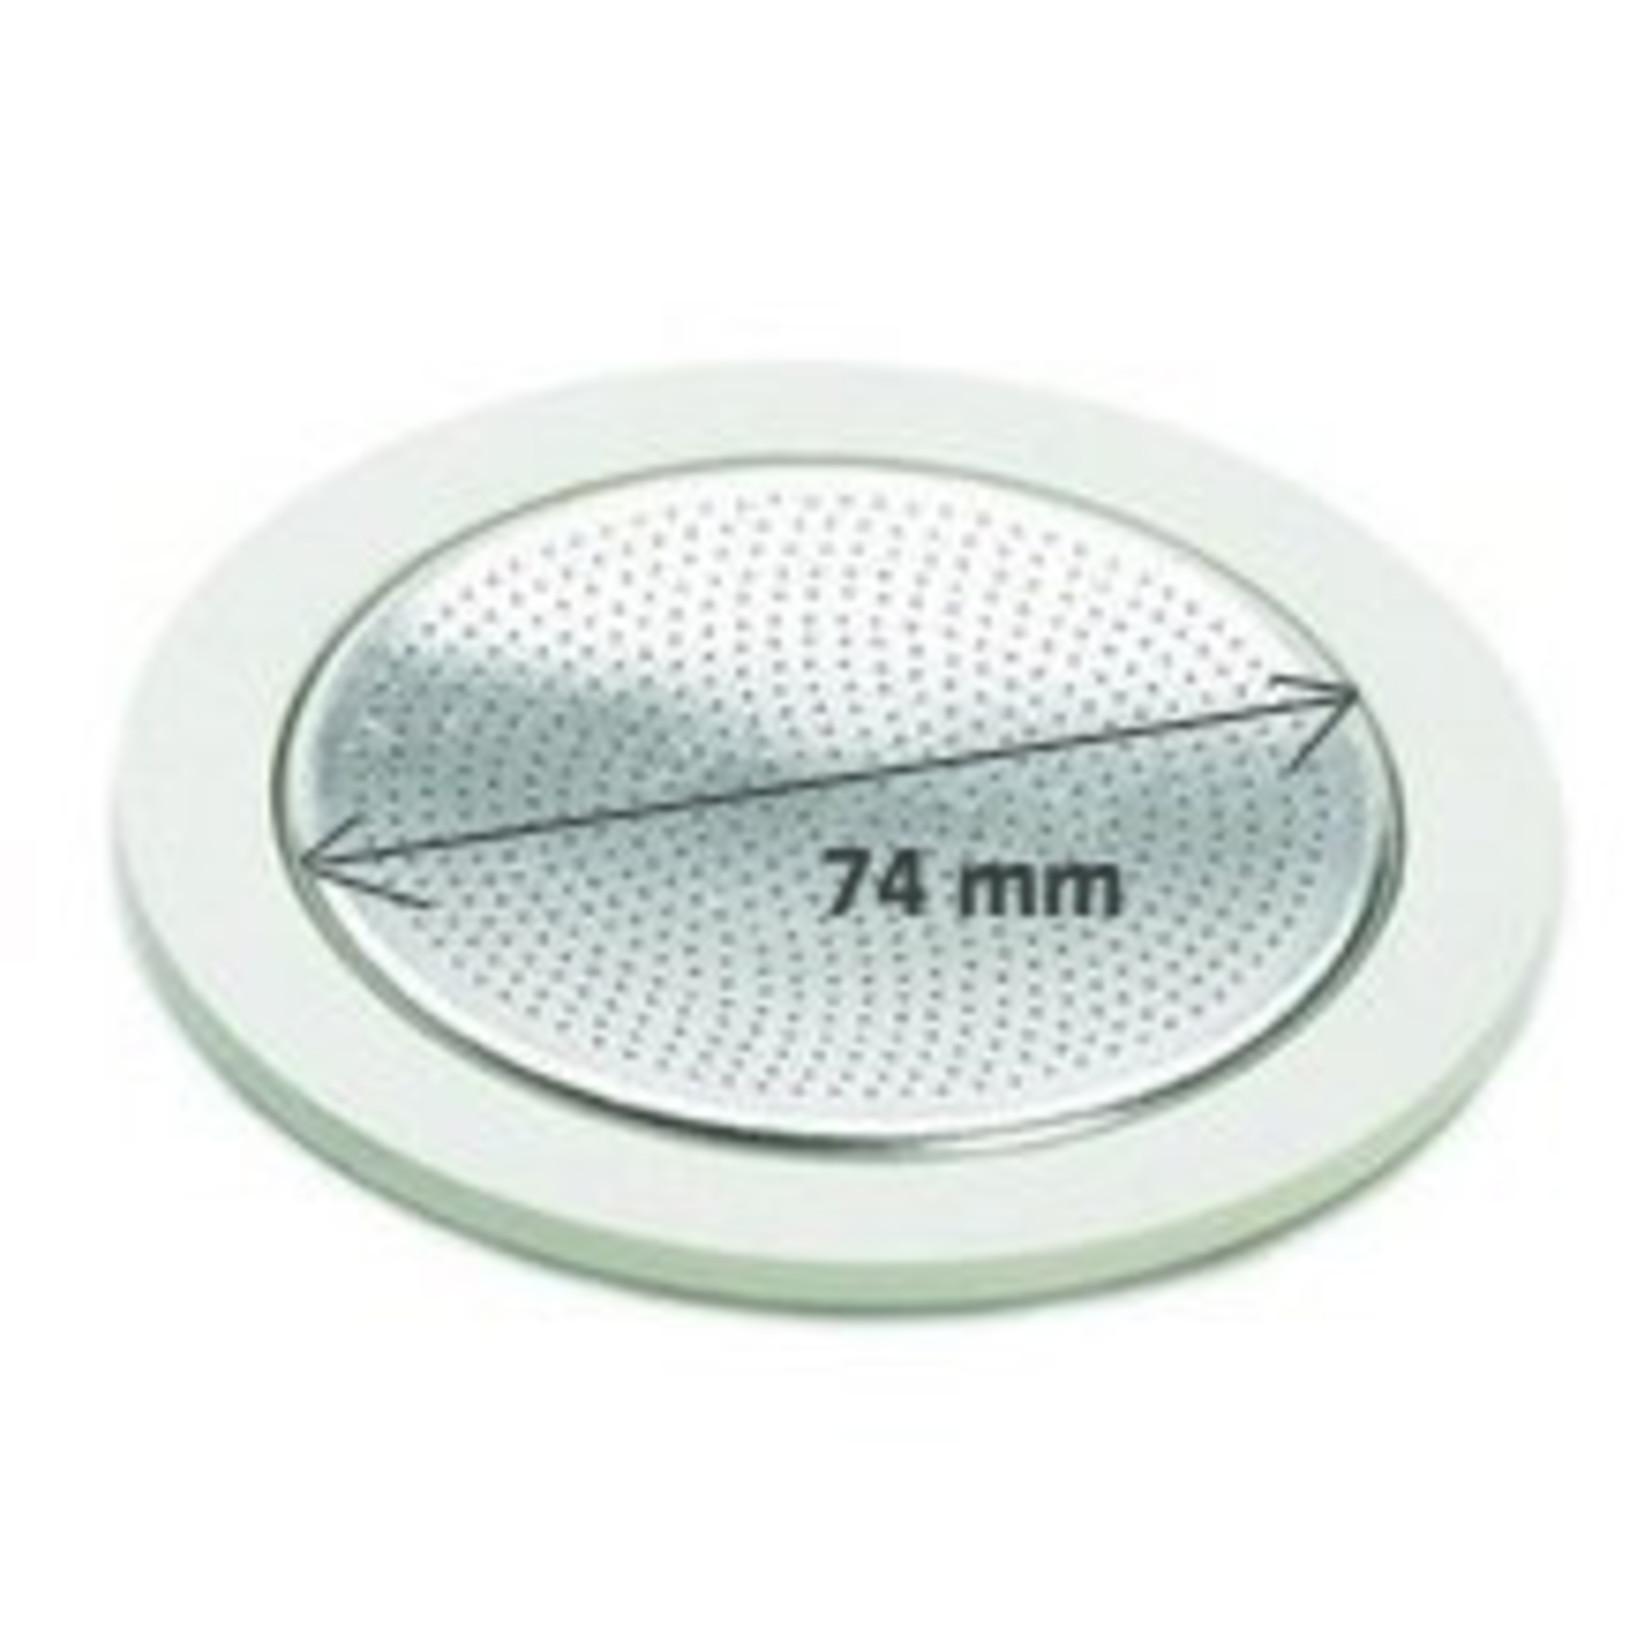 Bialetti Bialetti filterplaatje met rubberen ringen 12 kops aluminium